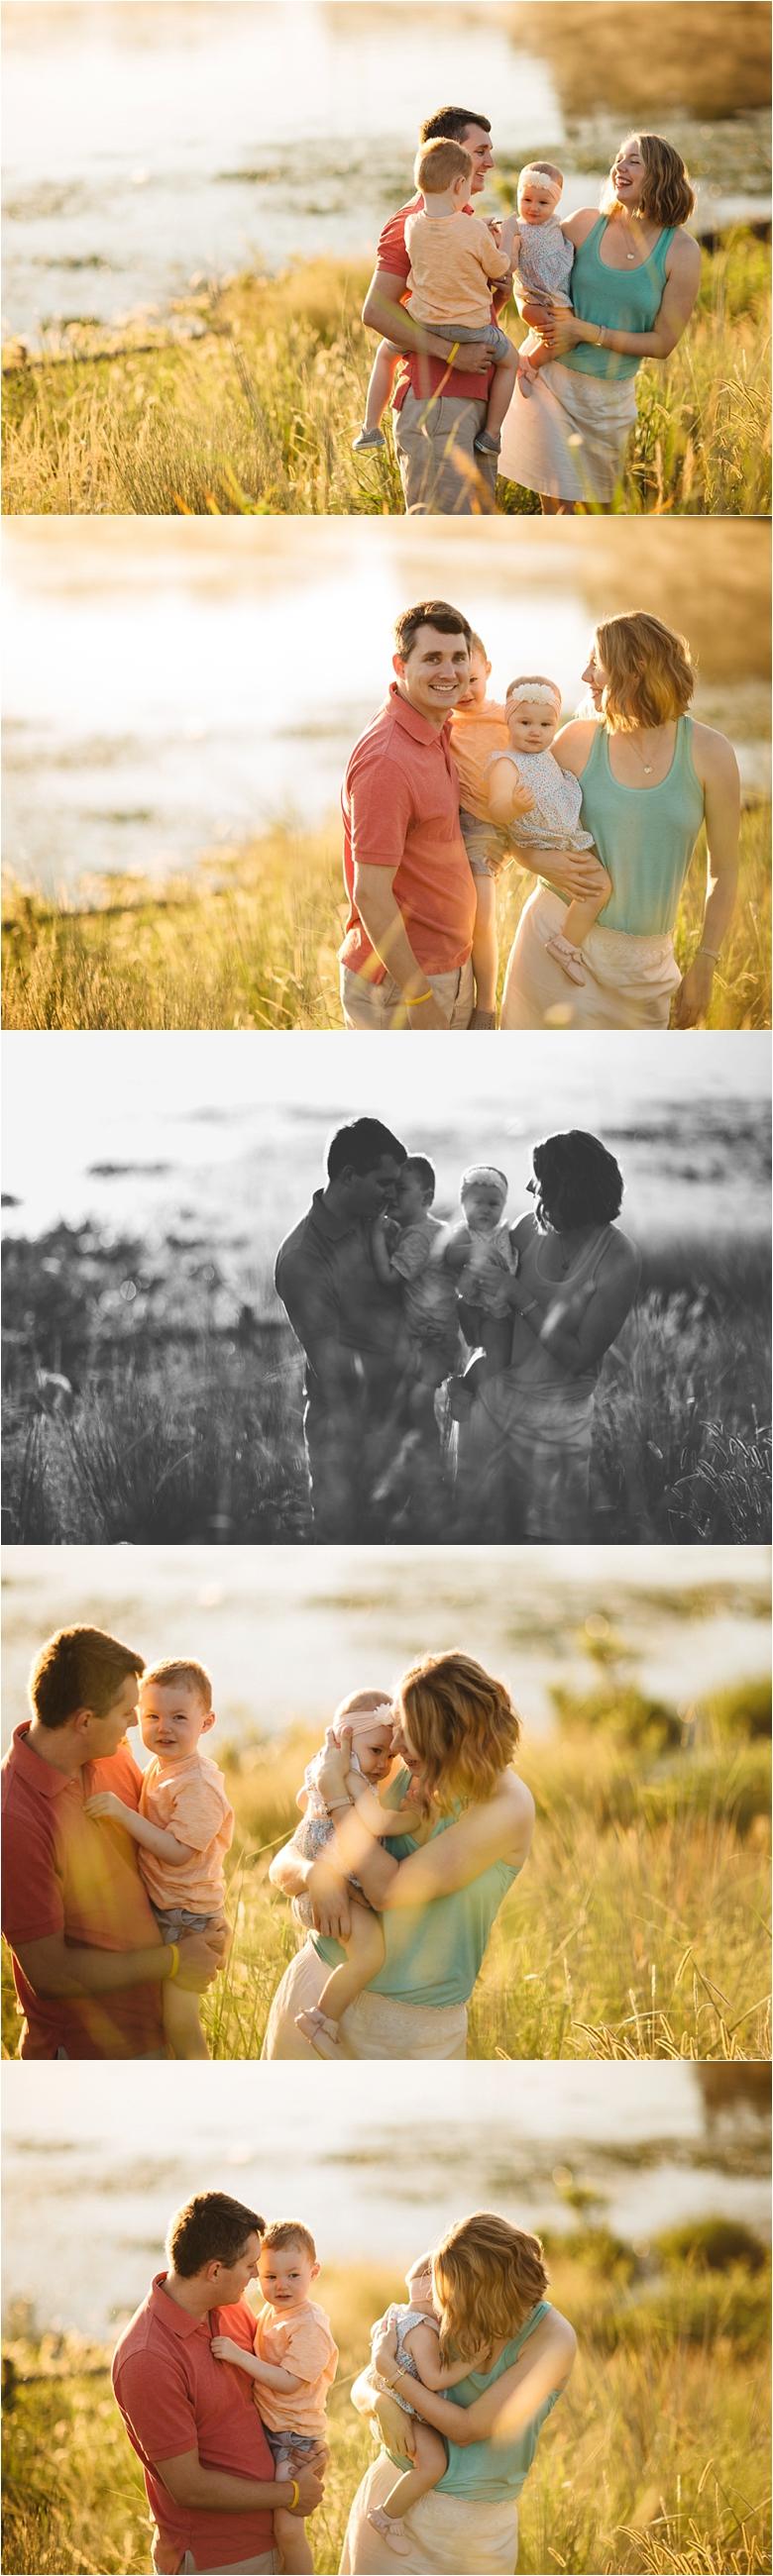 kansascityfamilyphotographer_0073